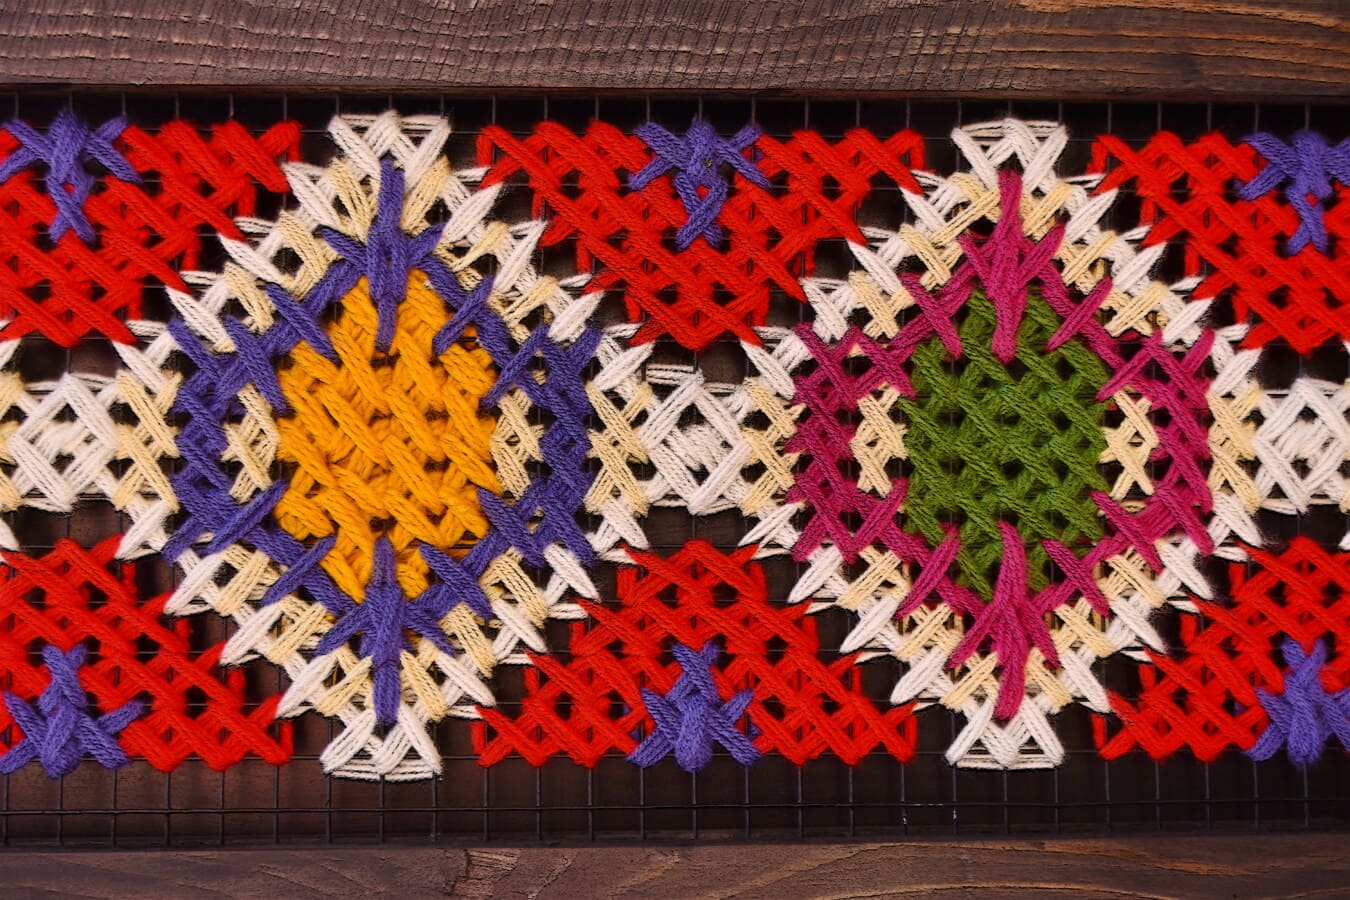 madera, marco, colorido, lana, nudo de, hilo de rosca, géneros de punto, fibra, vendimia, artesanía